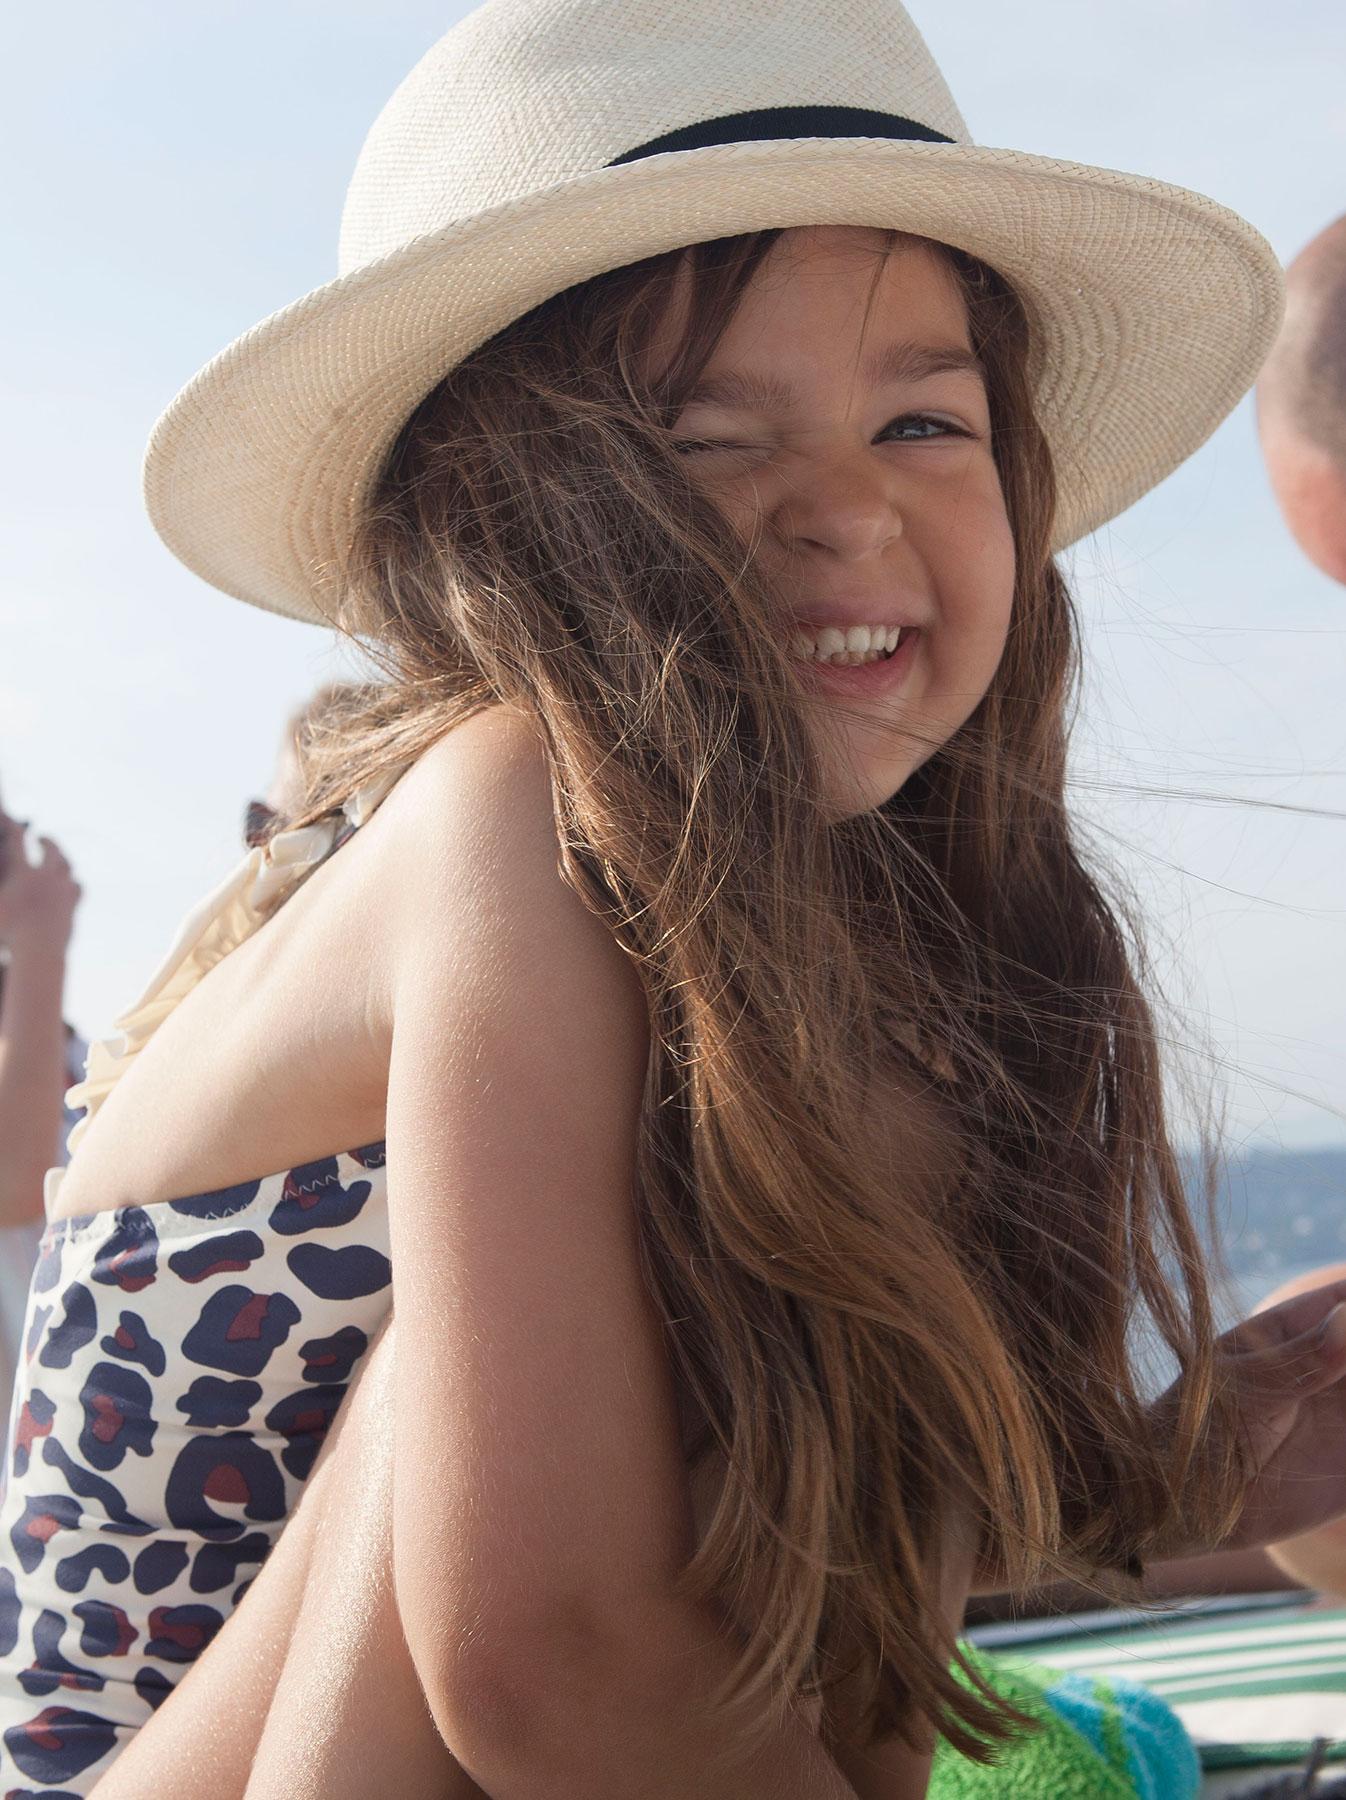 Rose-Family-Trip-to-France--Summer-'15_20150629_00086.jpg